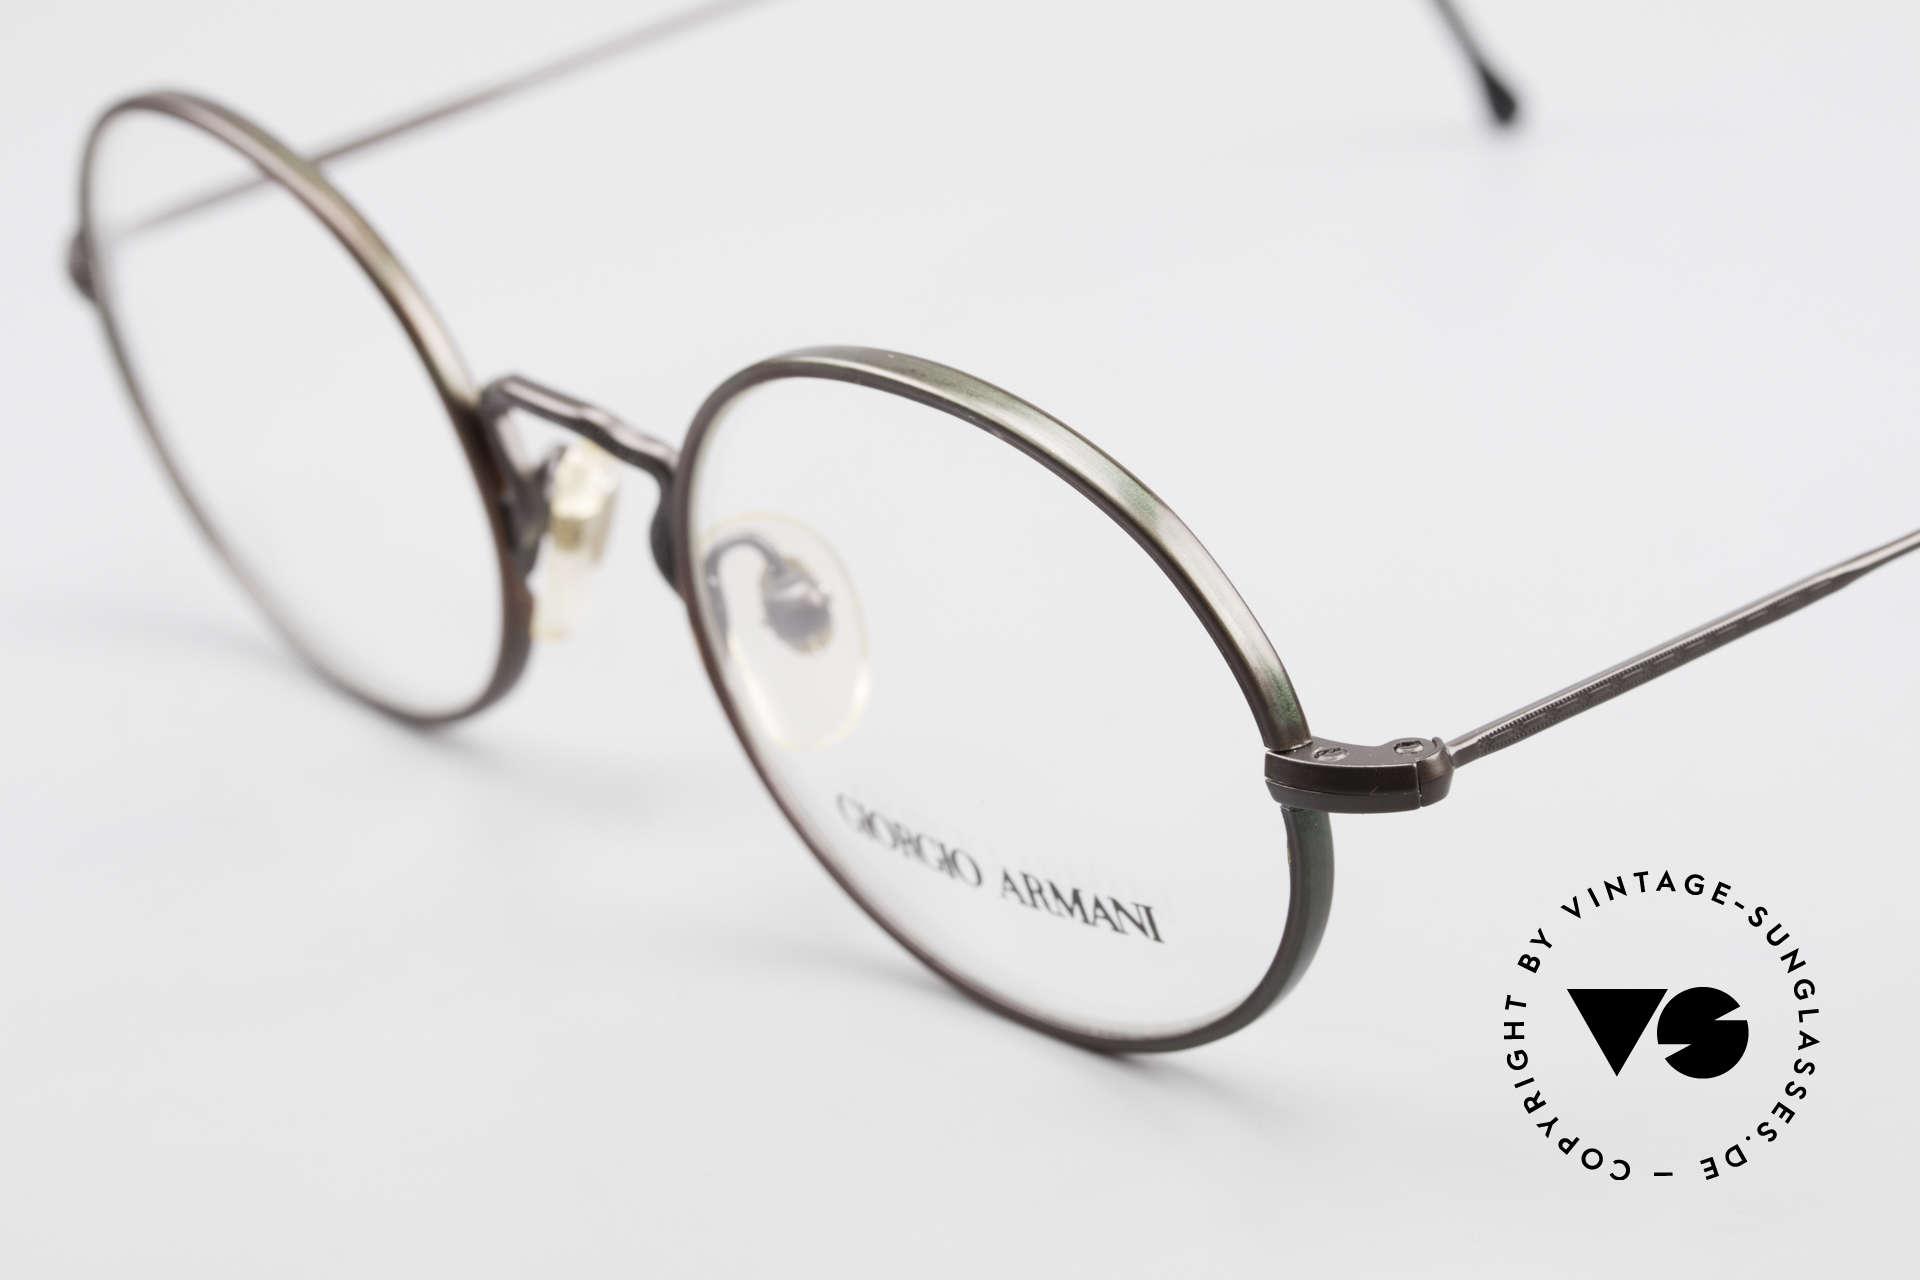 Giorgio Armani 247 Finish Shines Brown And Green, unworn rarity (like all our rare vintage GA eyewear), Made for Men